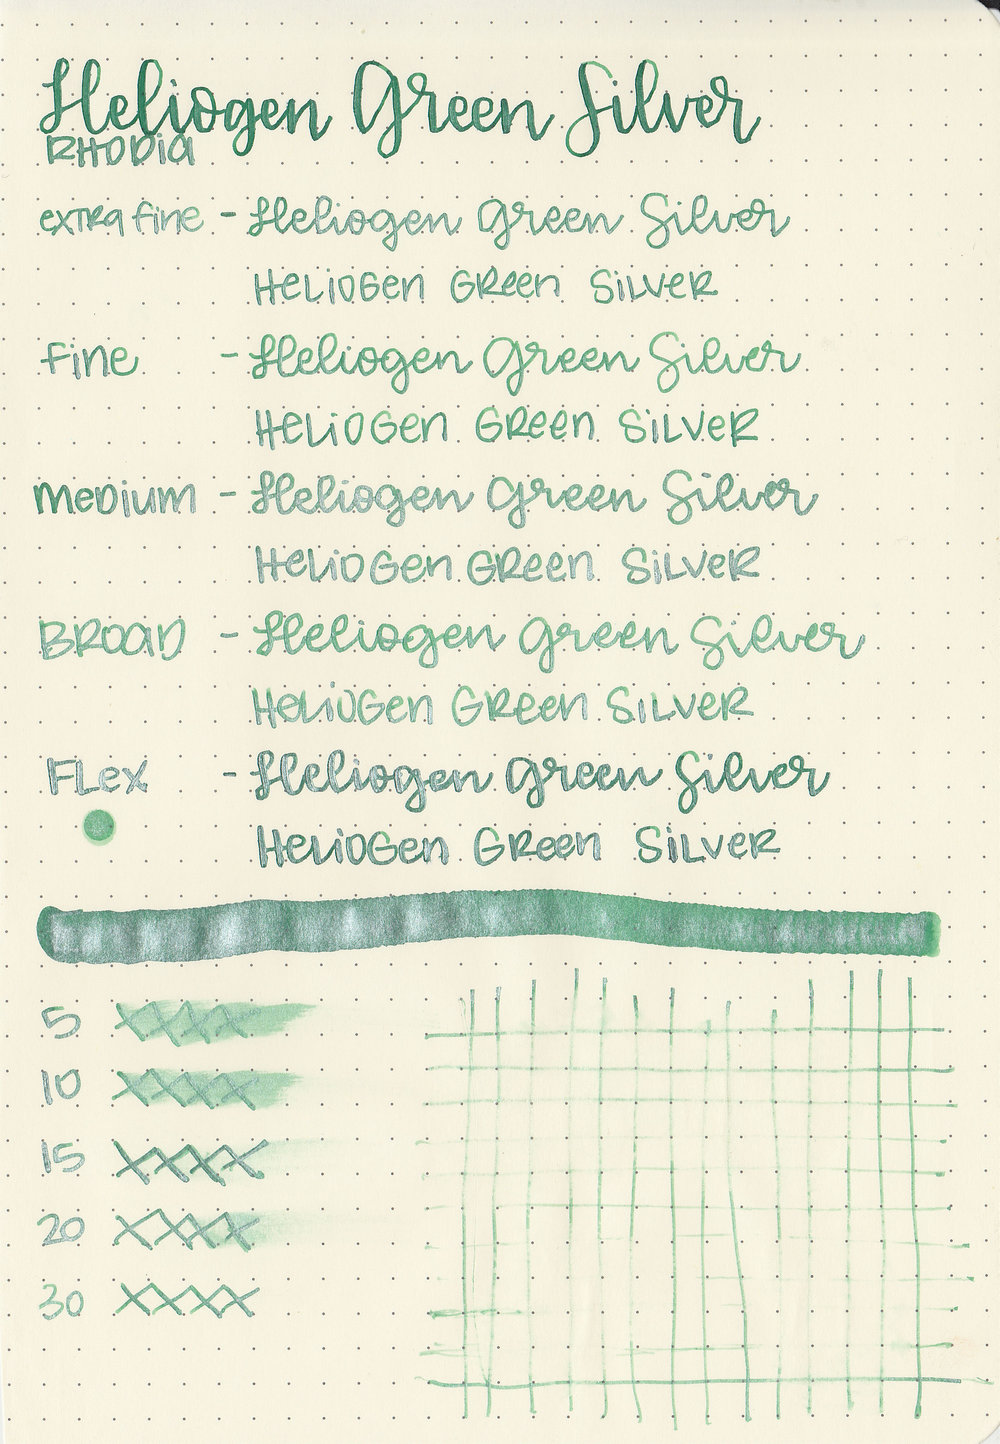 da-heliogen-green-8.jpg